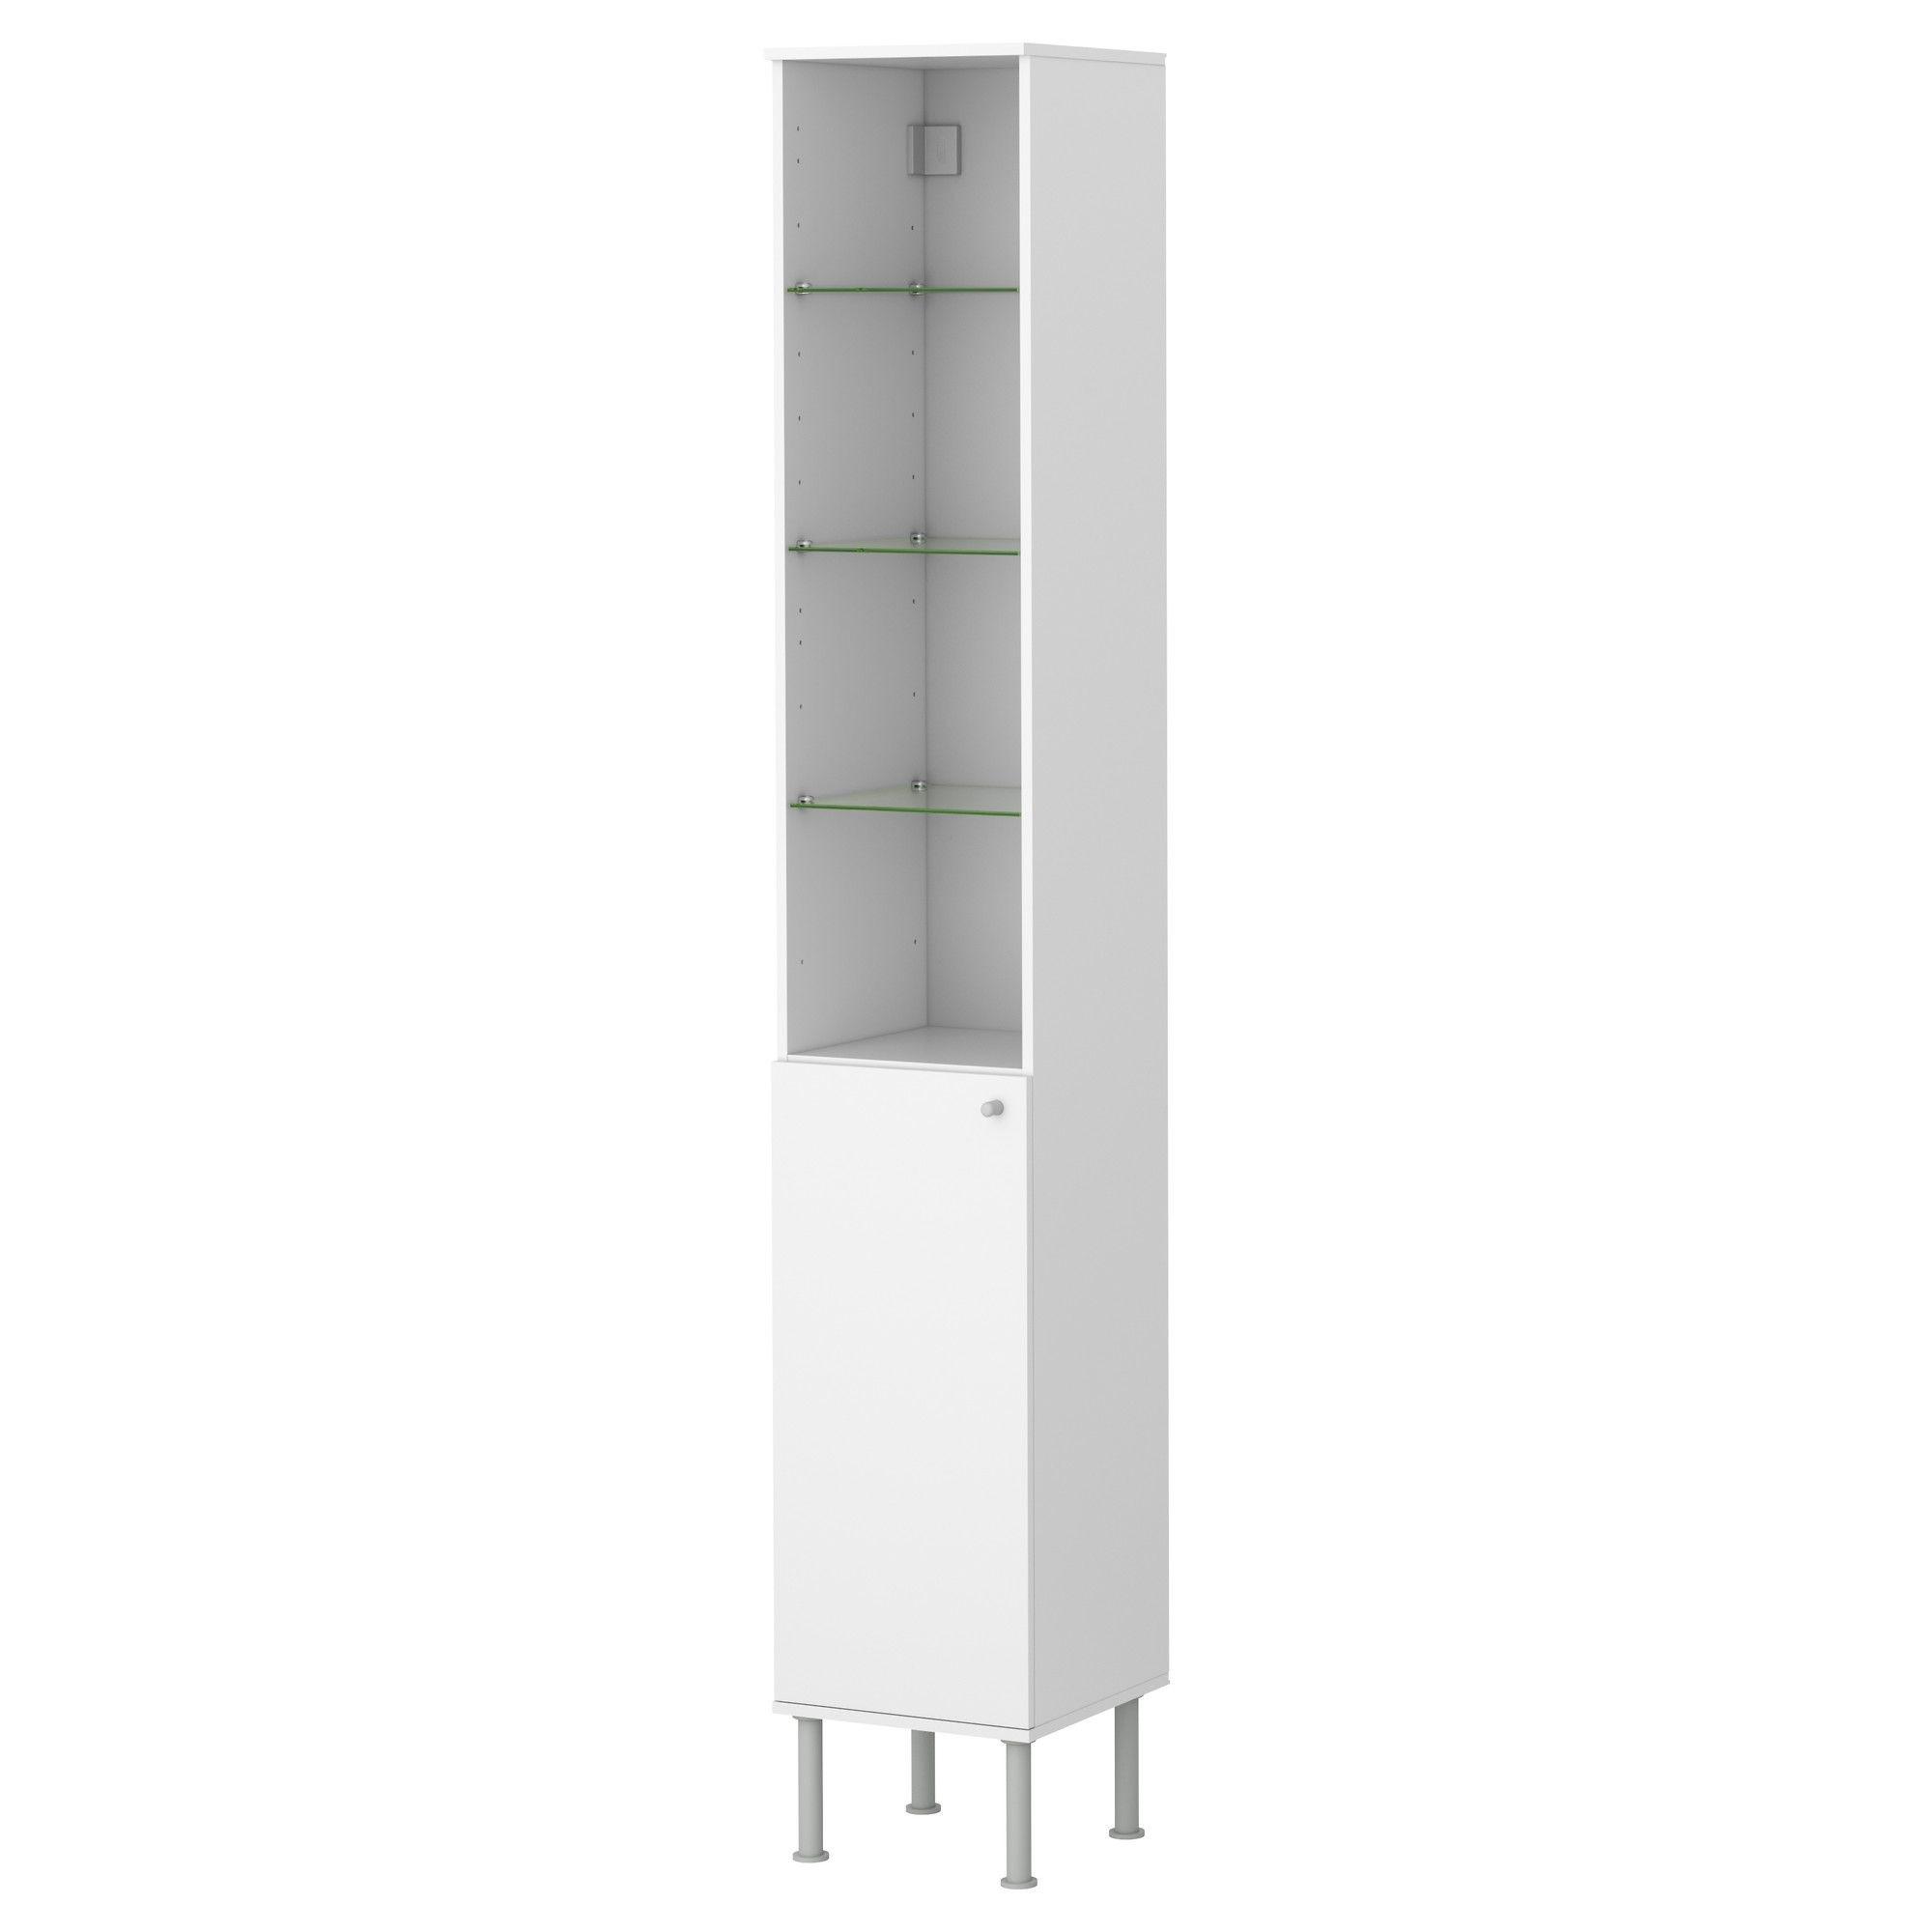 Attirant Tall Thin Cabinet